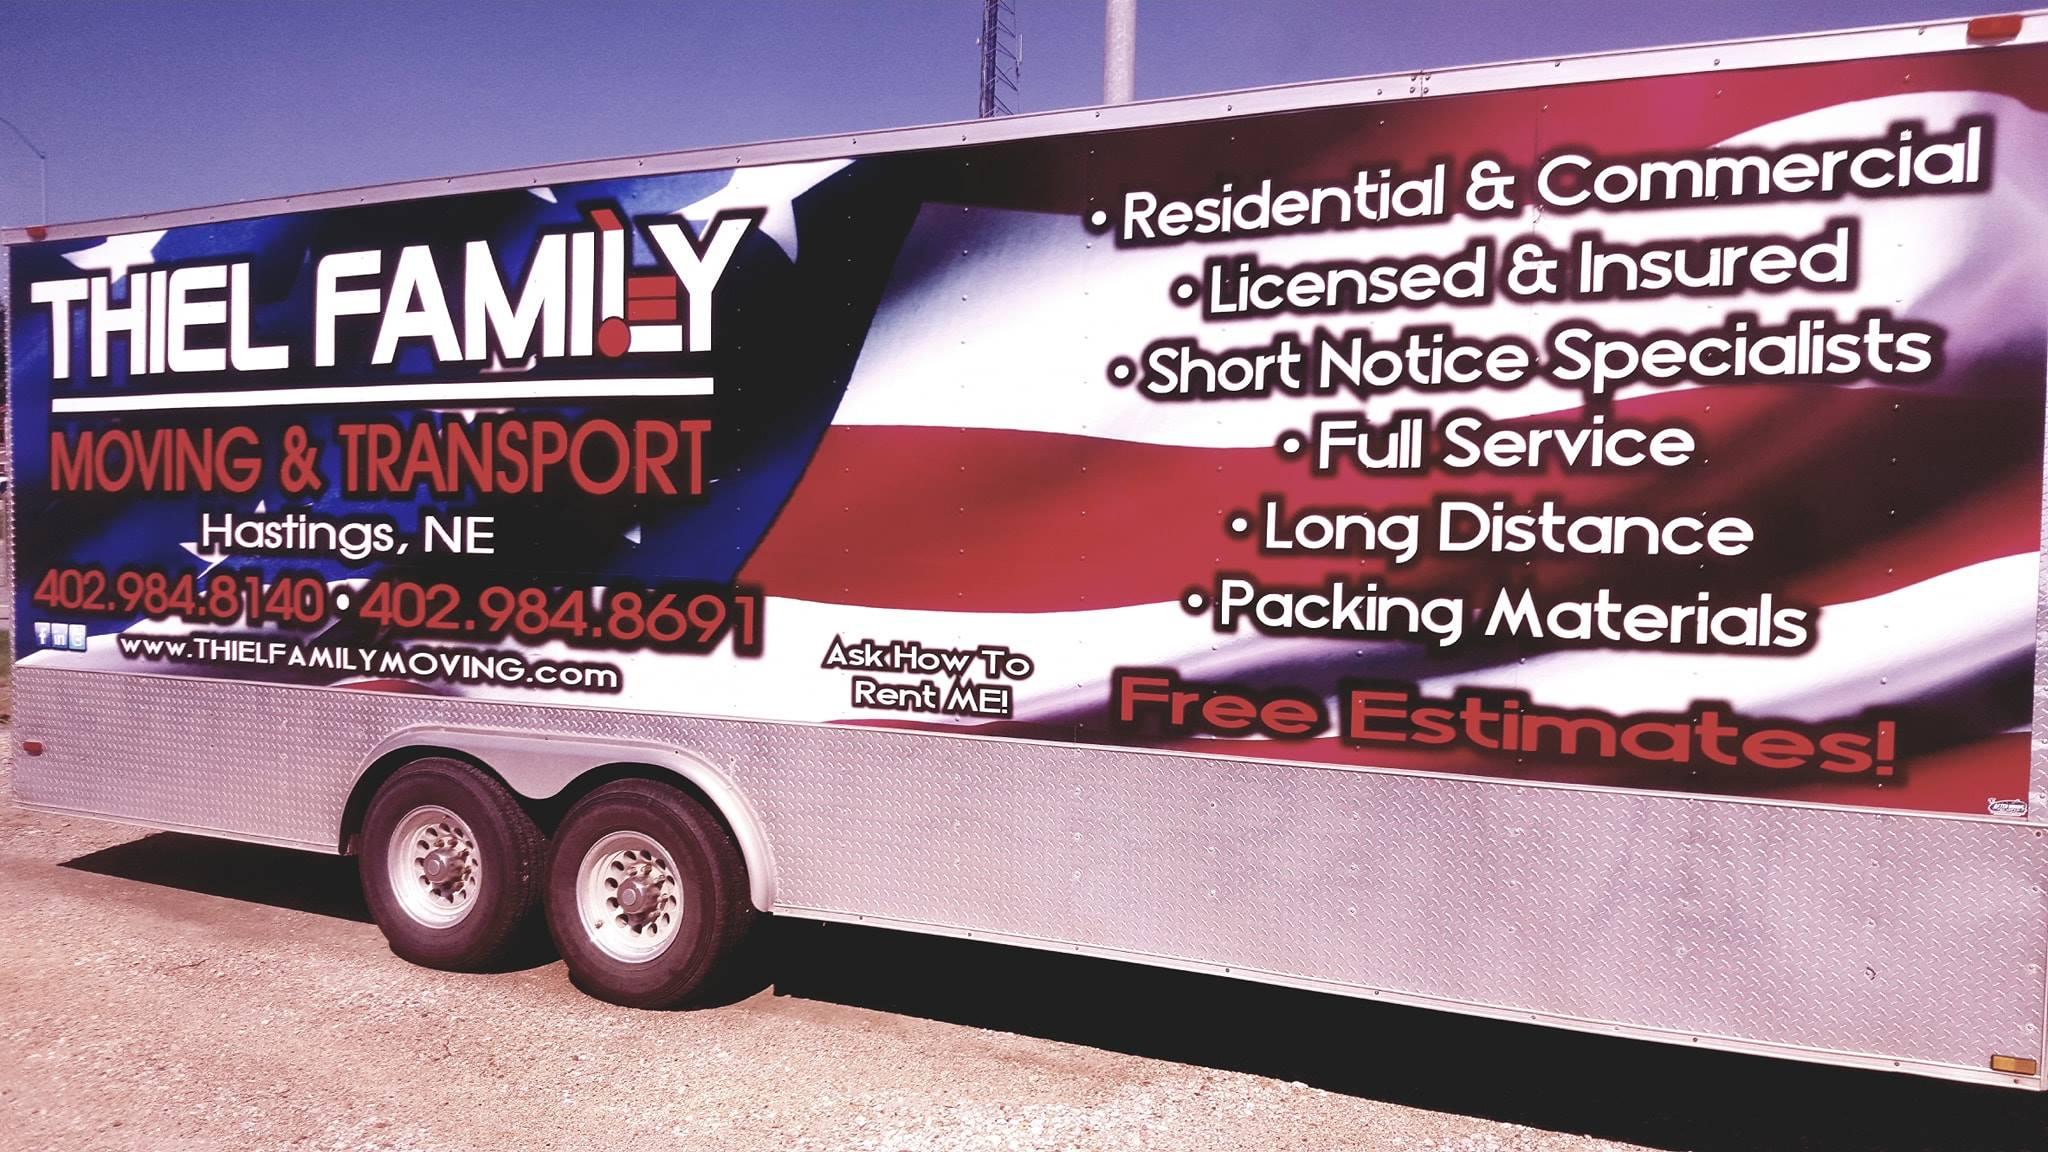 Nebraska's Top Rated Local® Moving Service Companies Award Winner: Thiel Family Moving & Transport